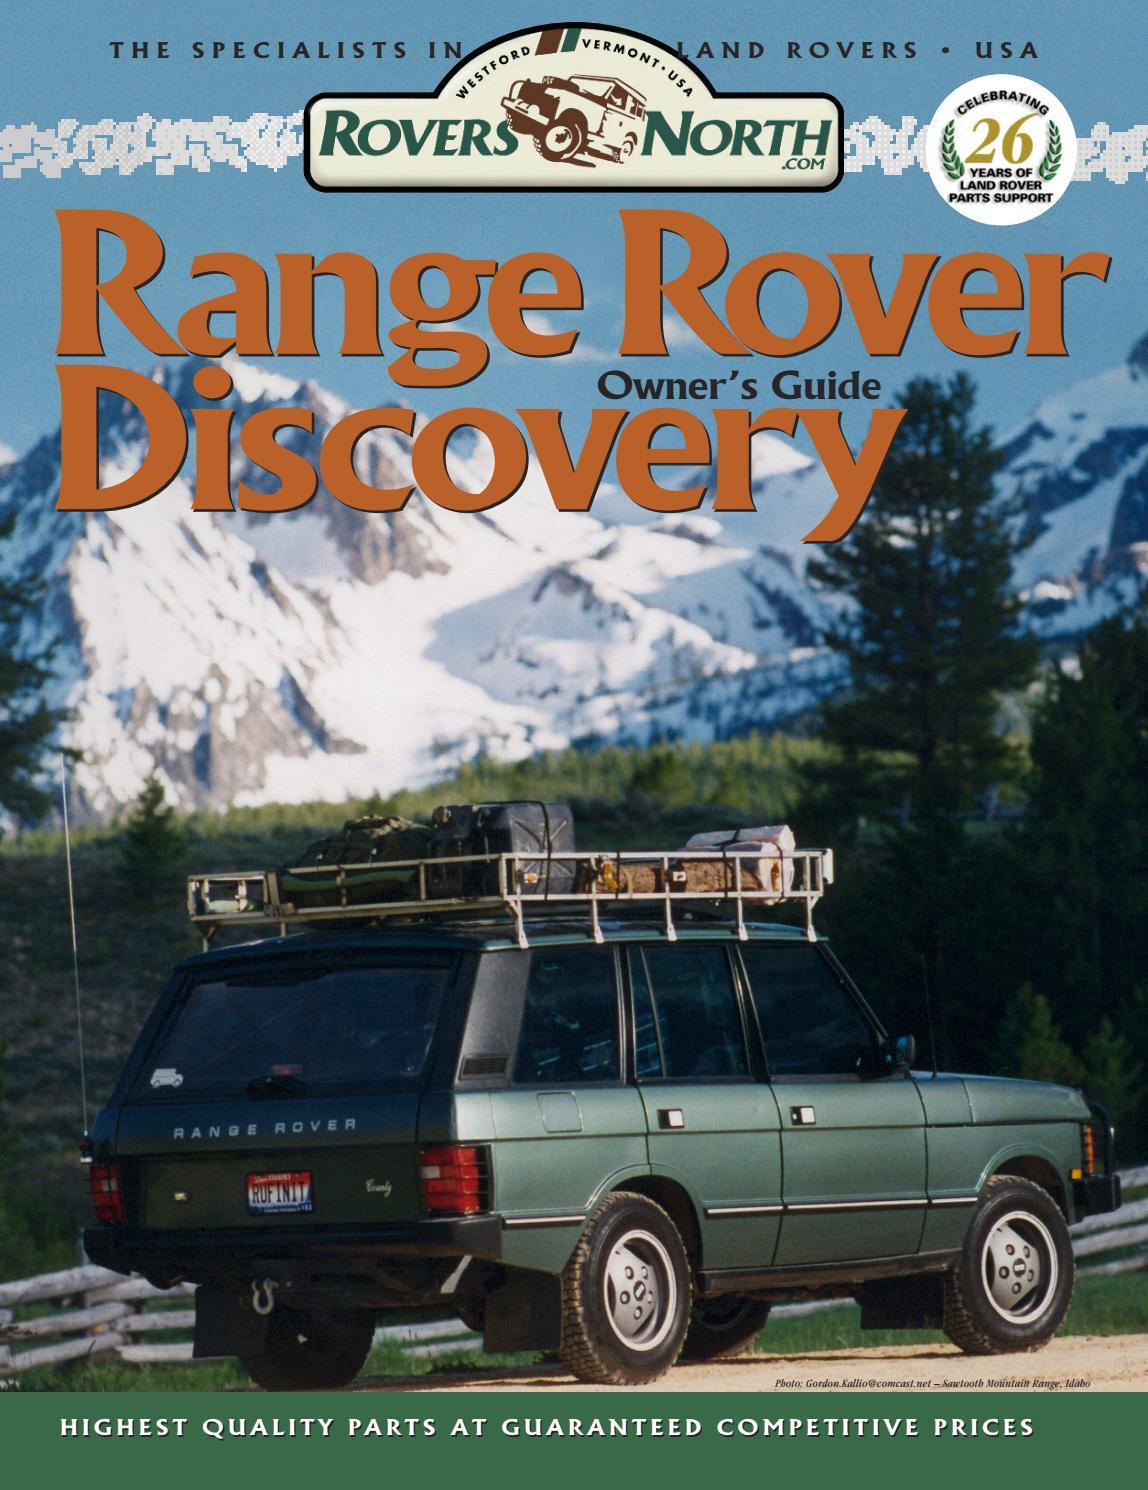 Radiator for Land Rover Range Rover 1995-1998 4.0L 4.6L